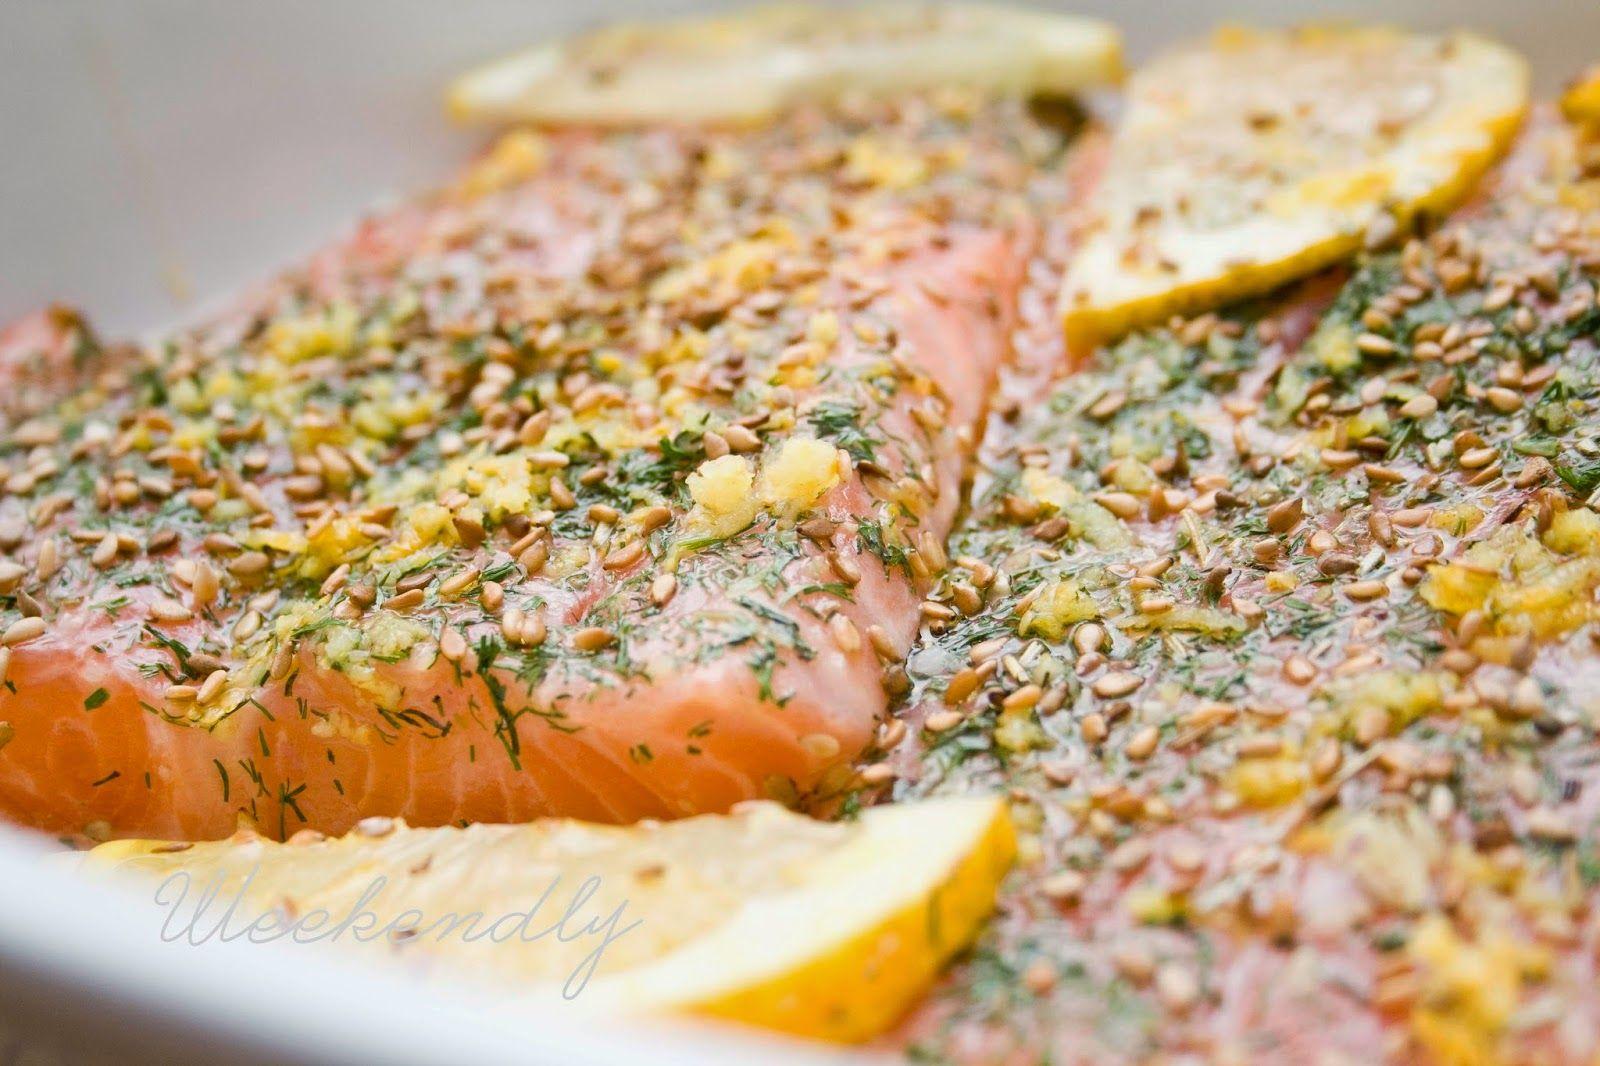 Grilled Salmon with sweet yogurt sauce